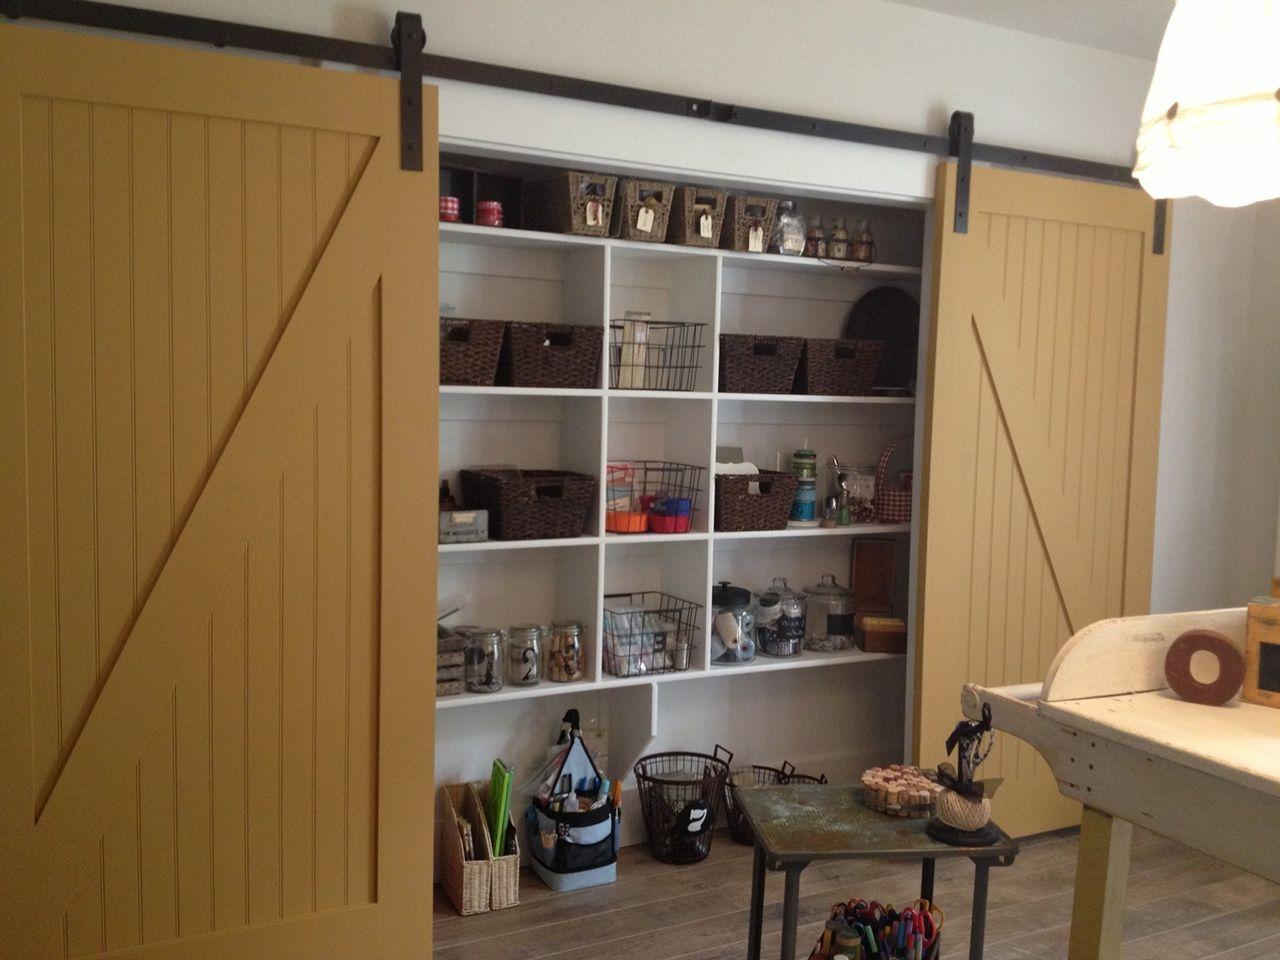 Garage Storage Cabinets With Sliding Doors | http://voteno123.com ...